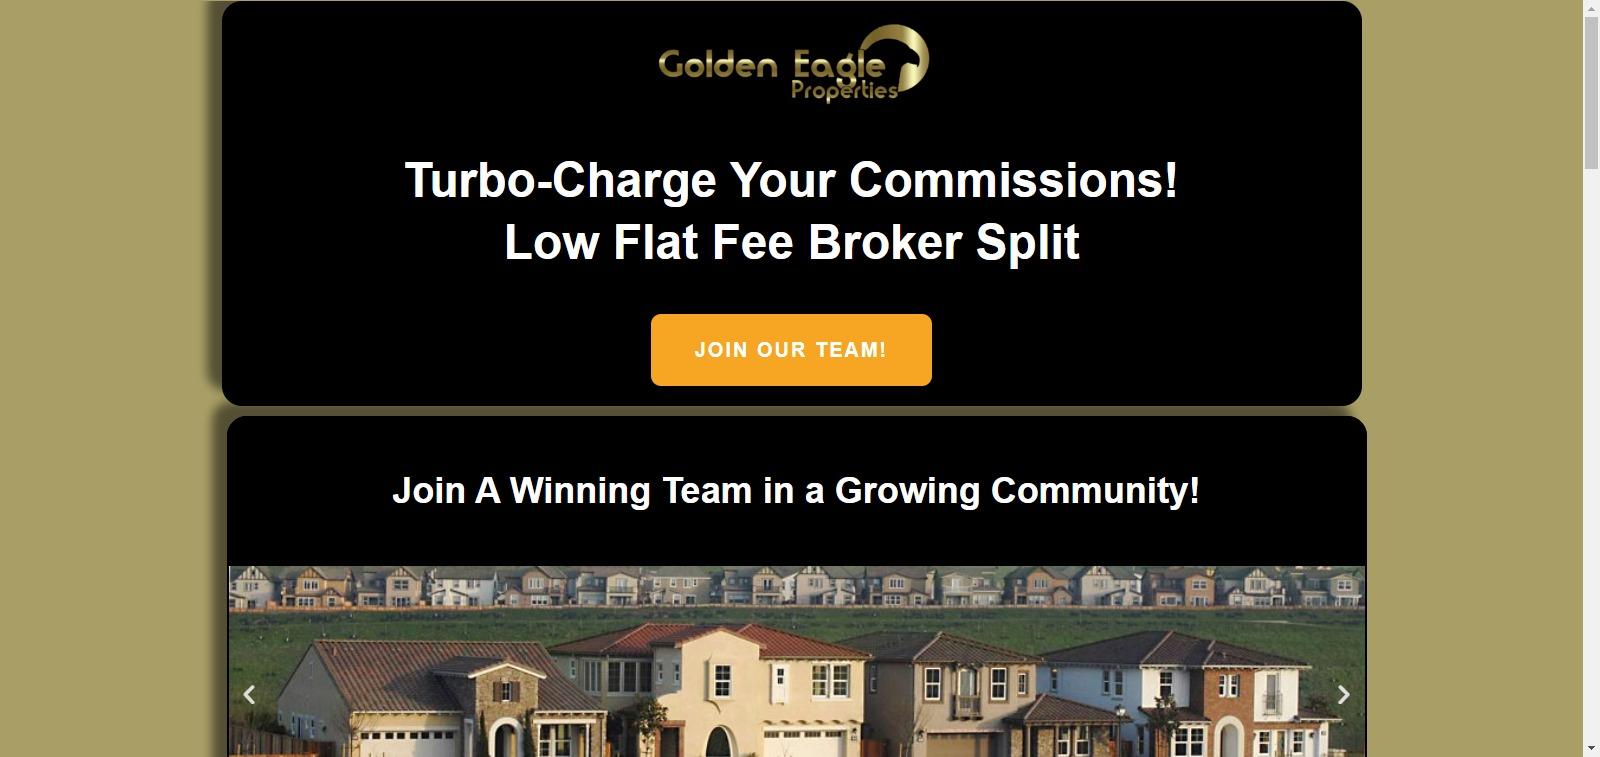 Join Golden Eagle Properties